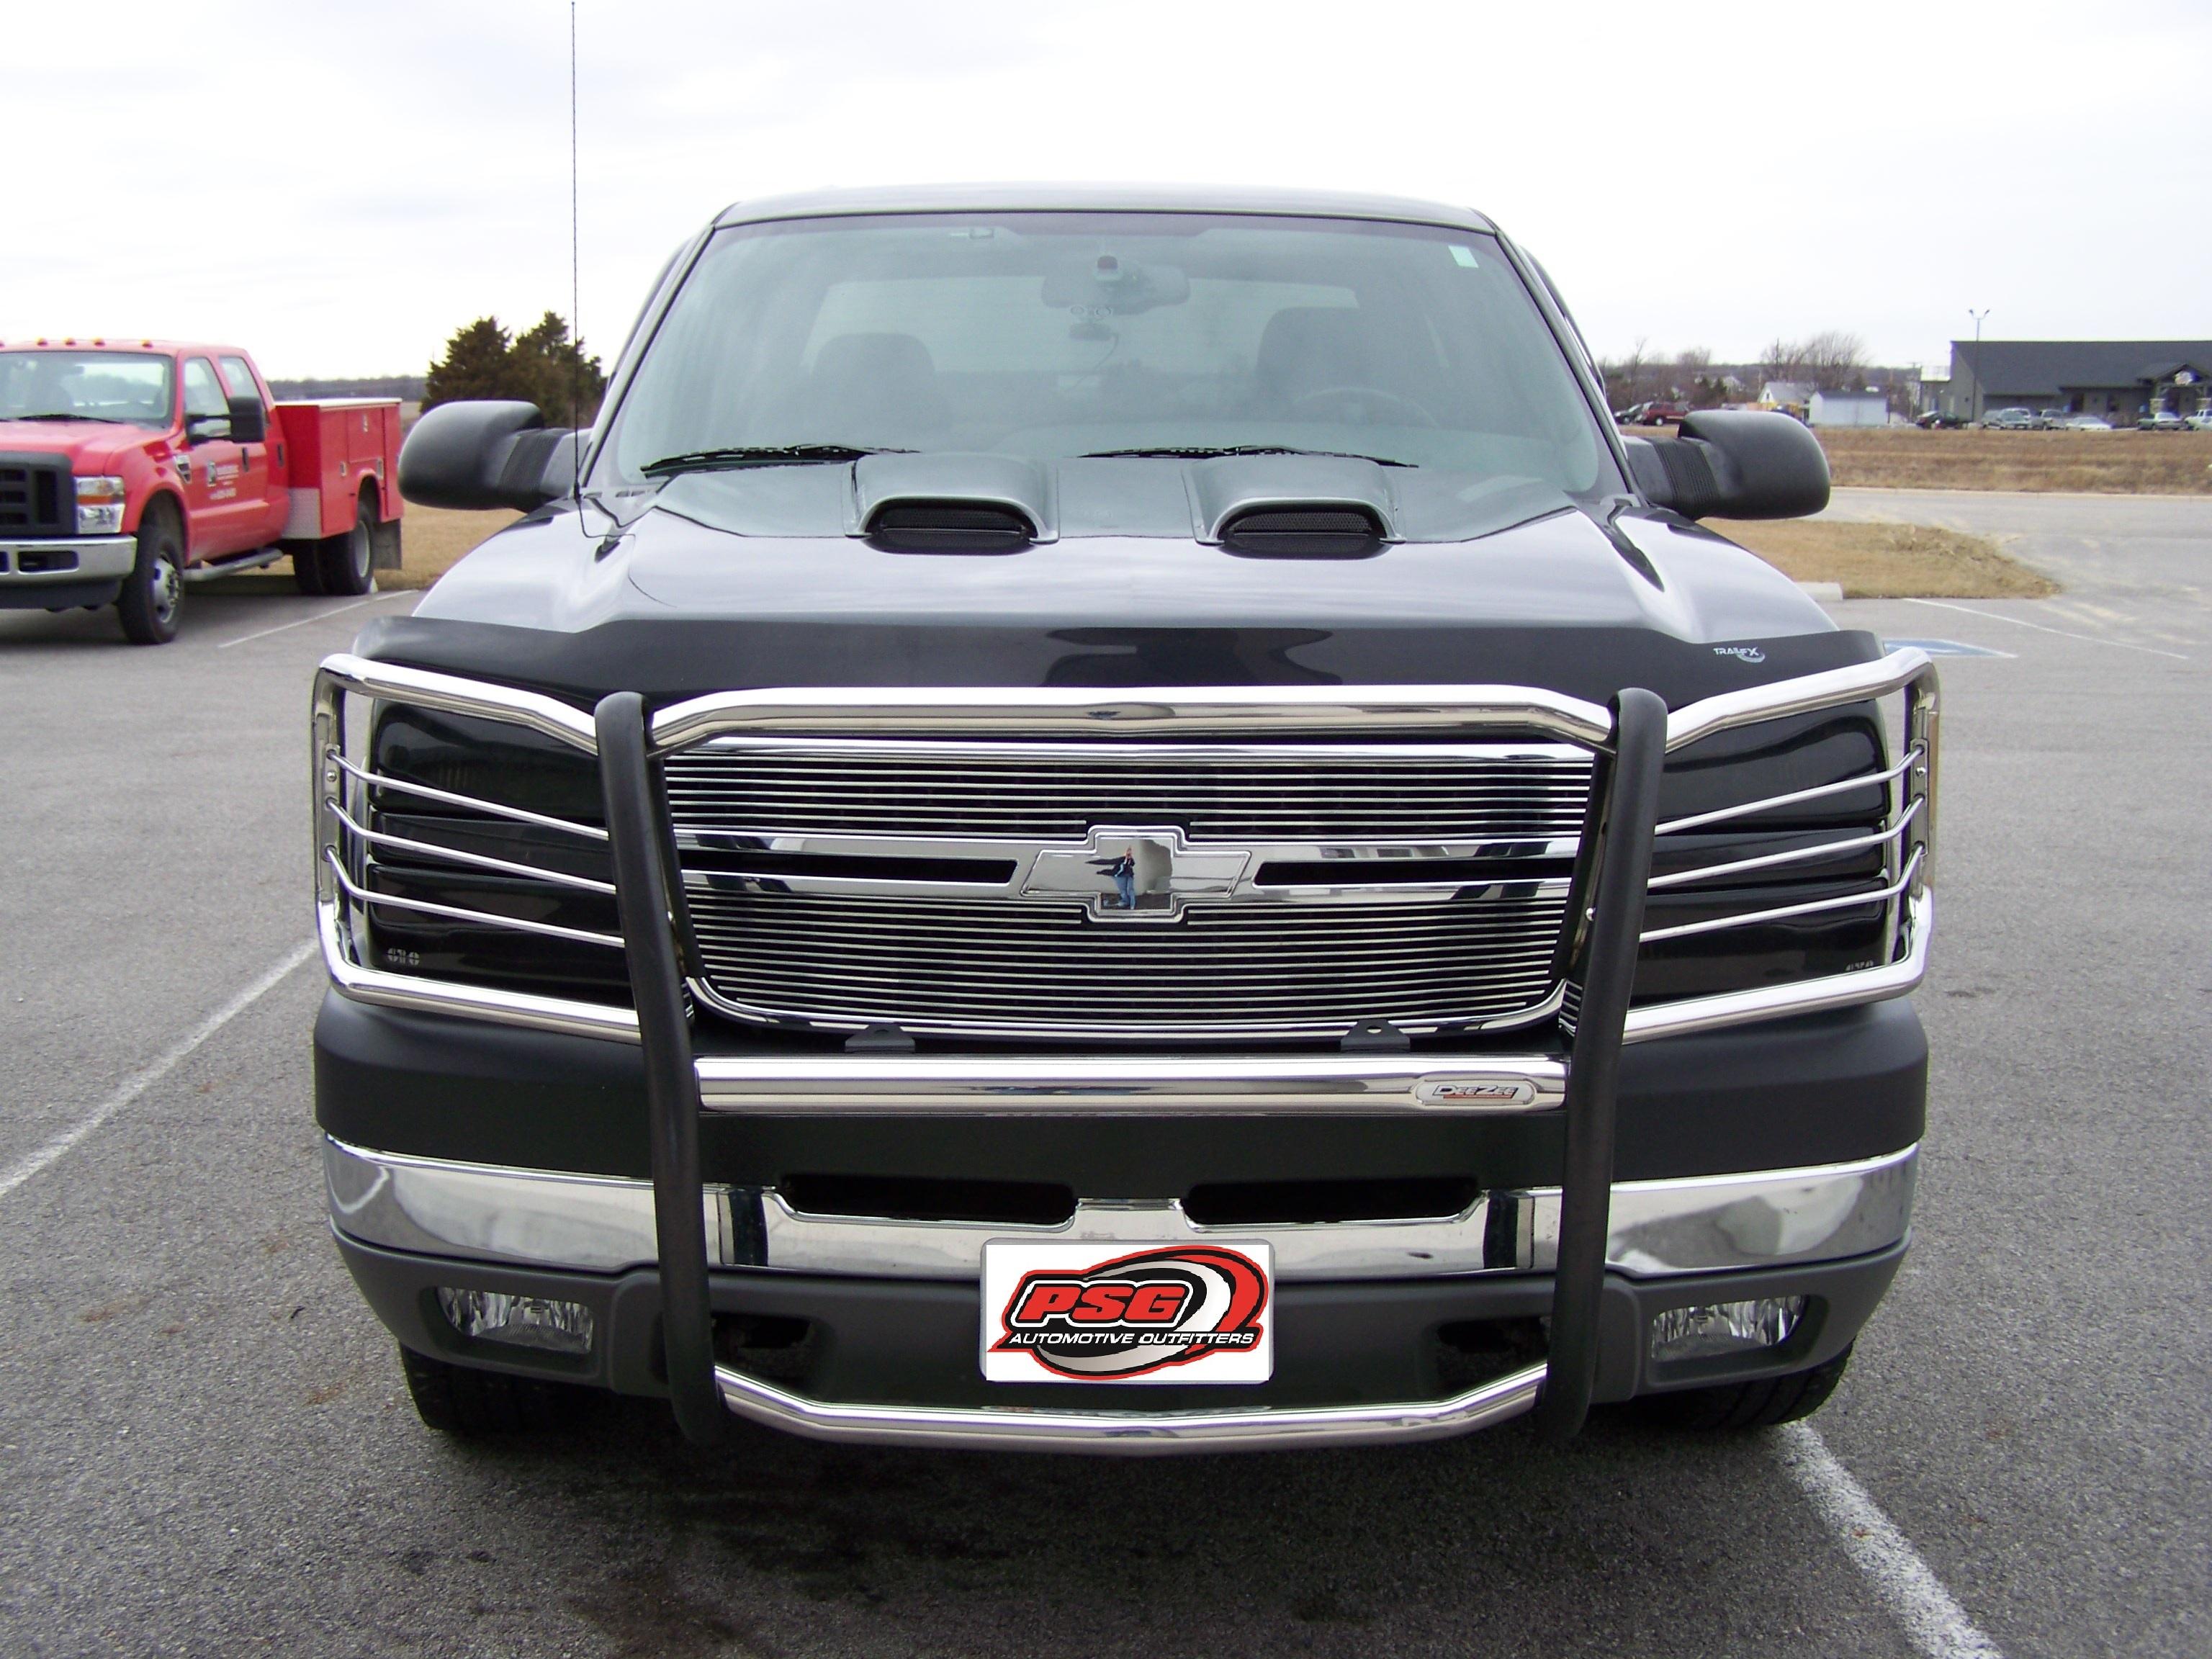 Truck Accessories Ohio Columbus Truck Accessories Dayton